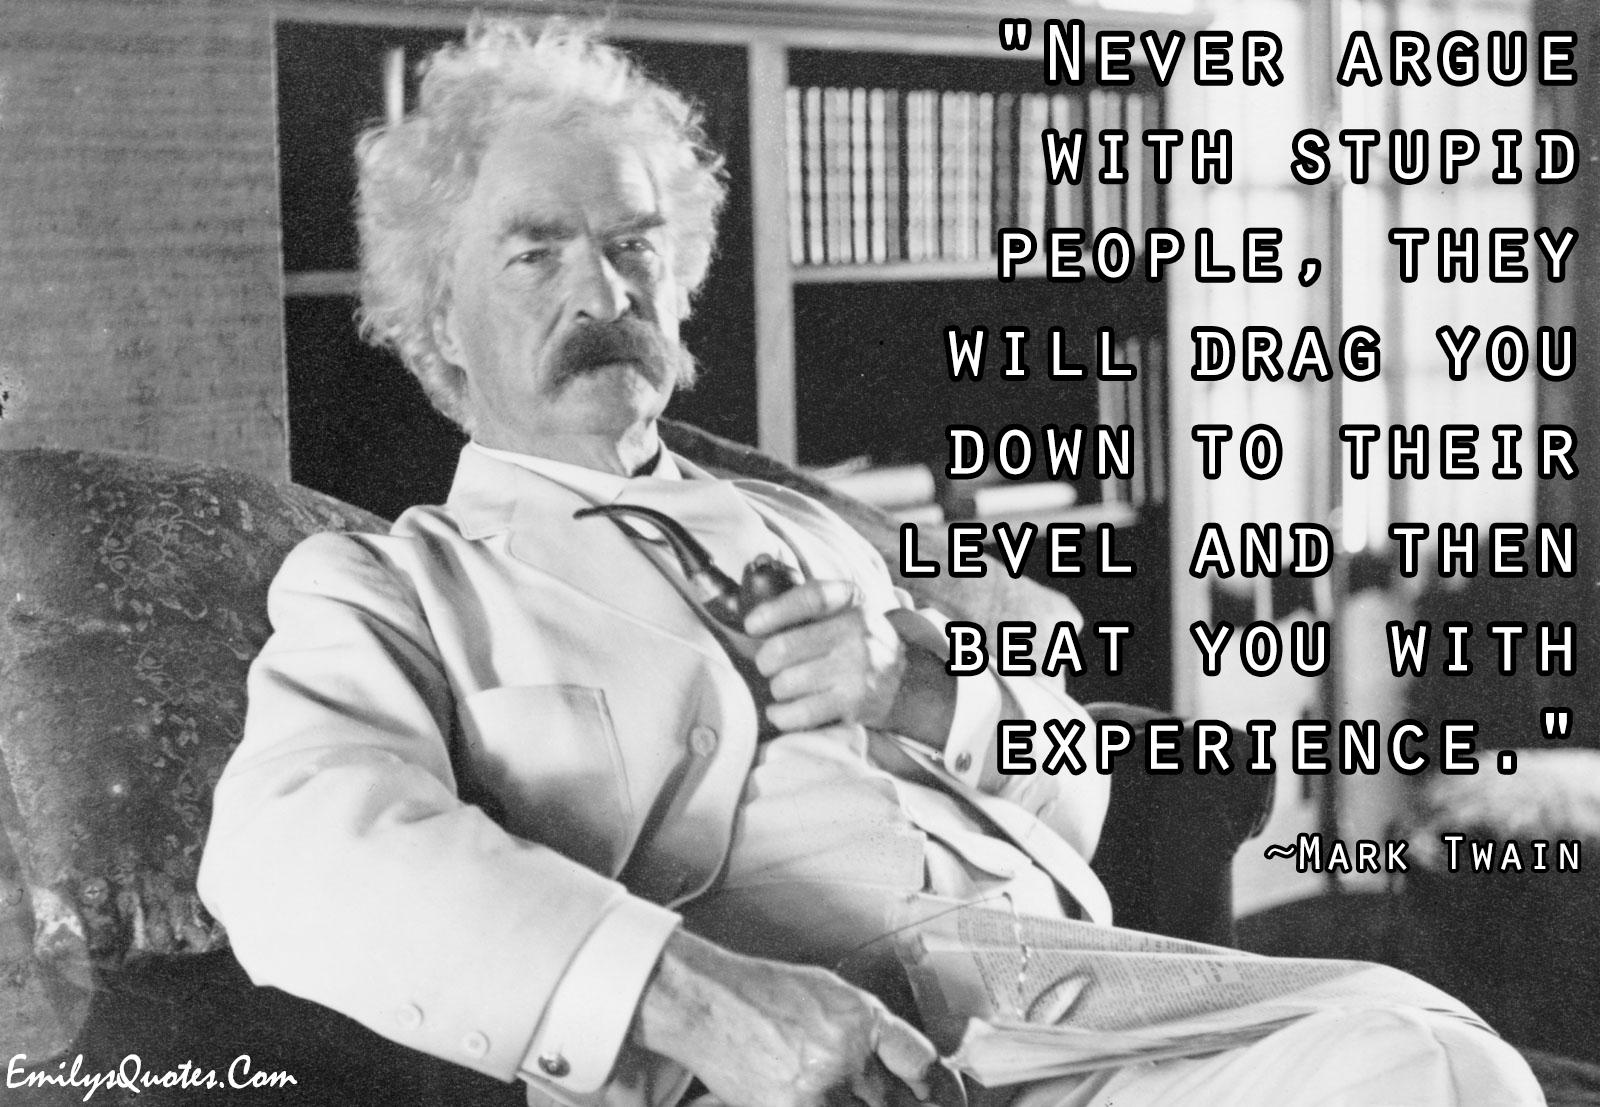 EmilysQuotes.Com - Intelligence, Mark Twain, experience, stupid people, argue, funny